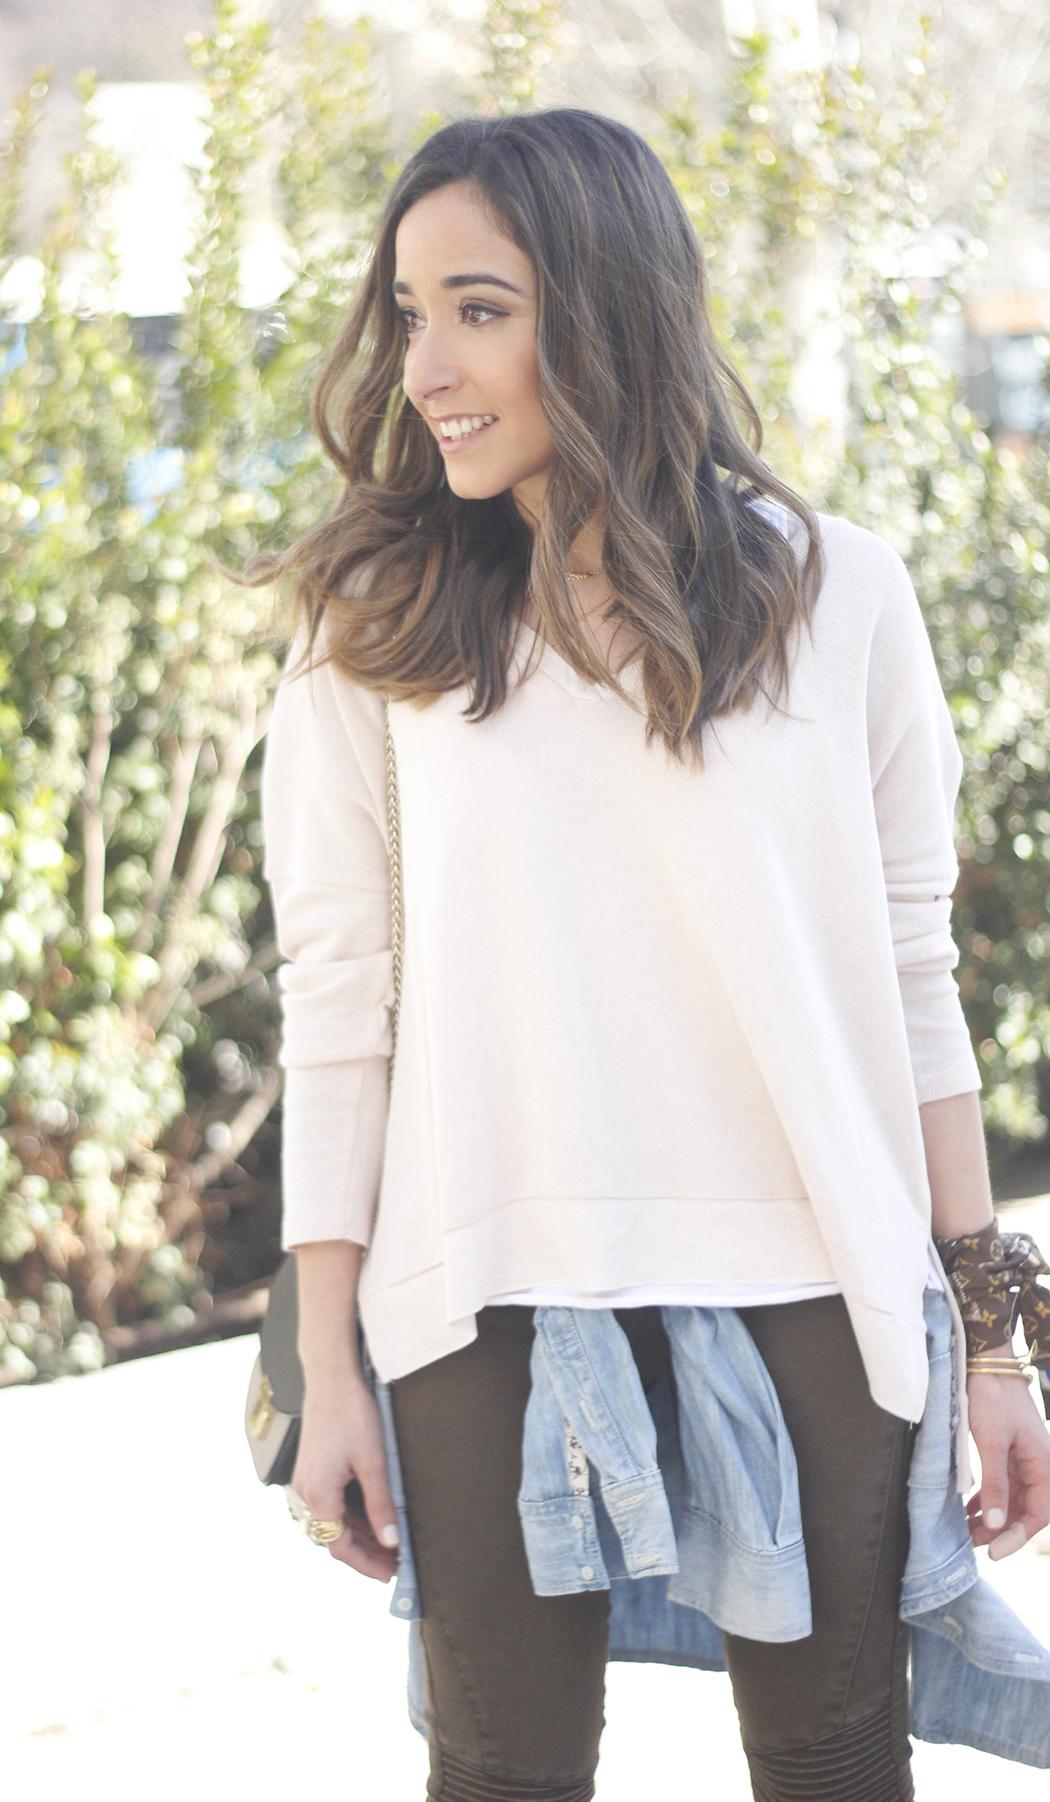 Khaki Pants pale pink sweater uterqüe bag accessories heels fashion outfit03